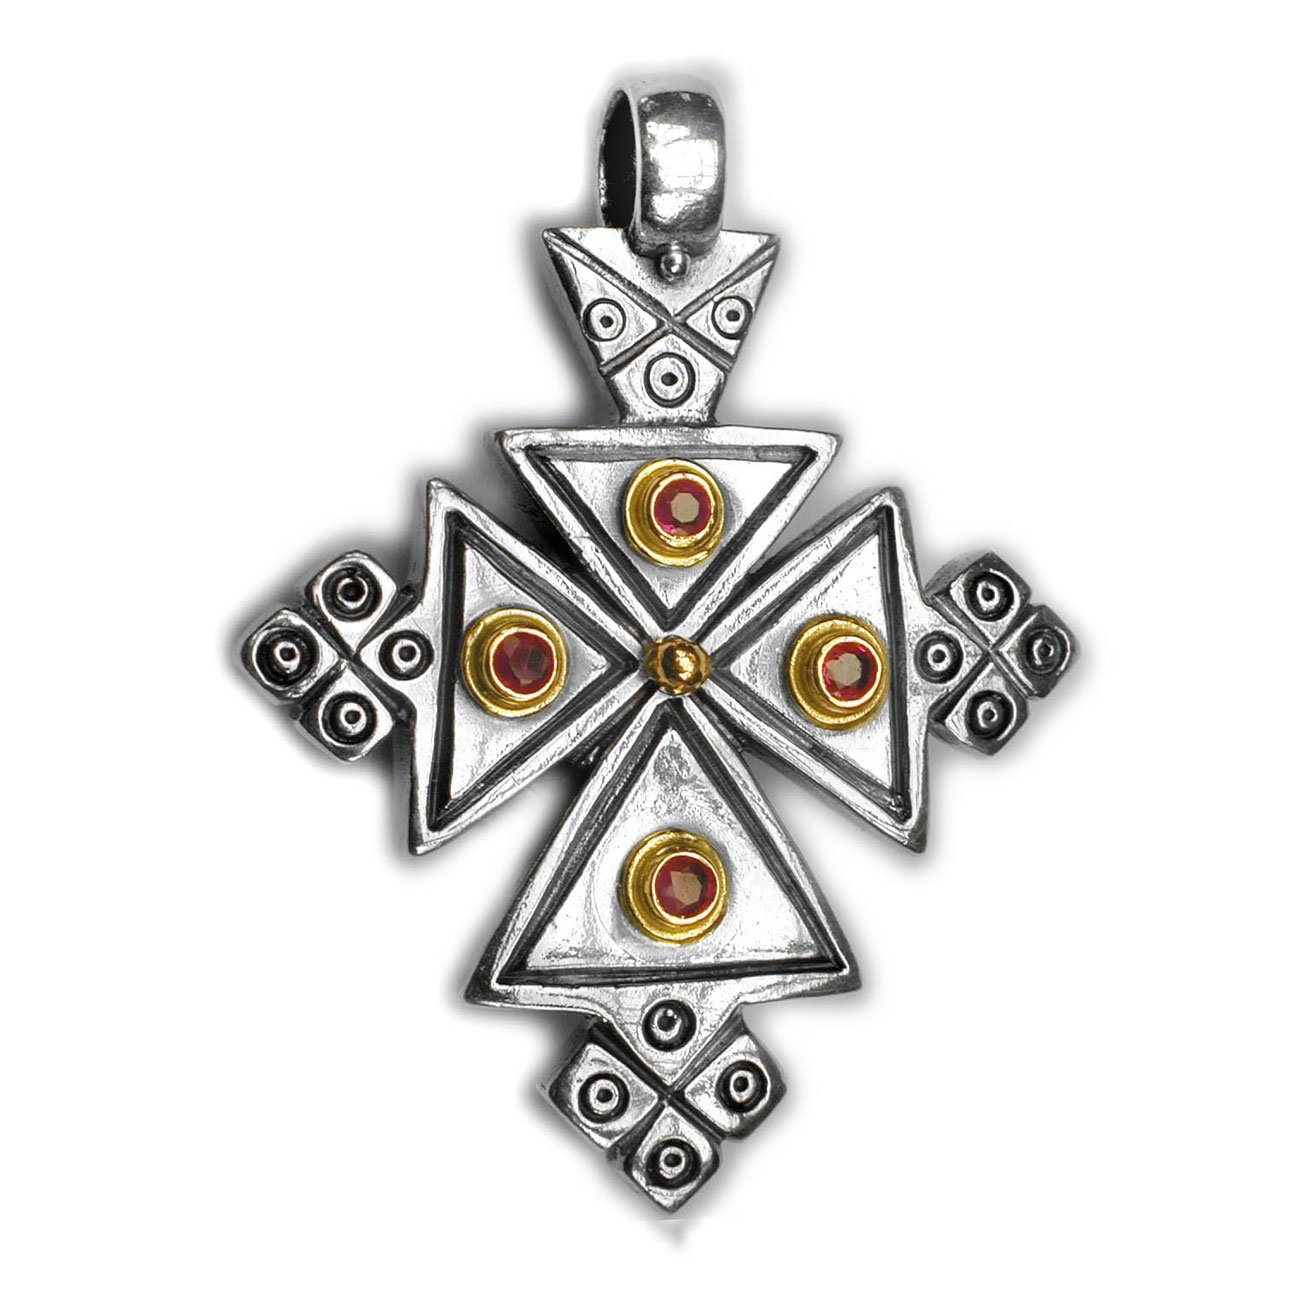 Gerochristo 5051 - Solid 18K Gold, Sterling Silver & Ruby Coptic Cross Pendant